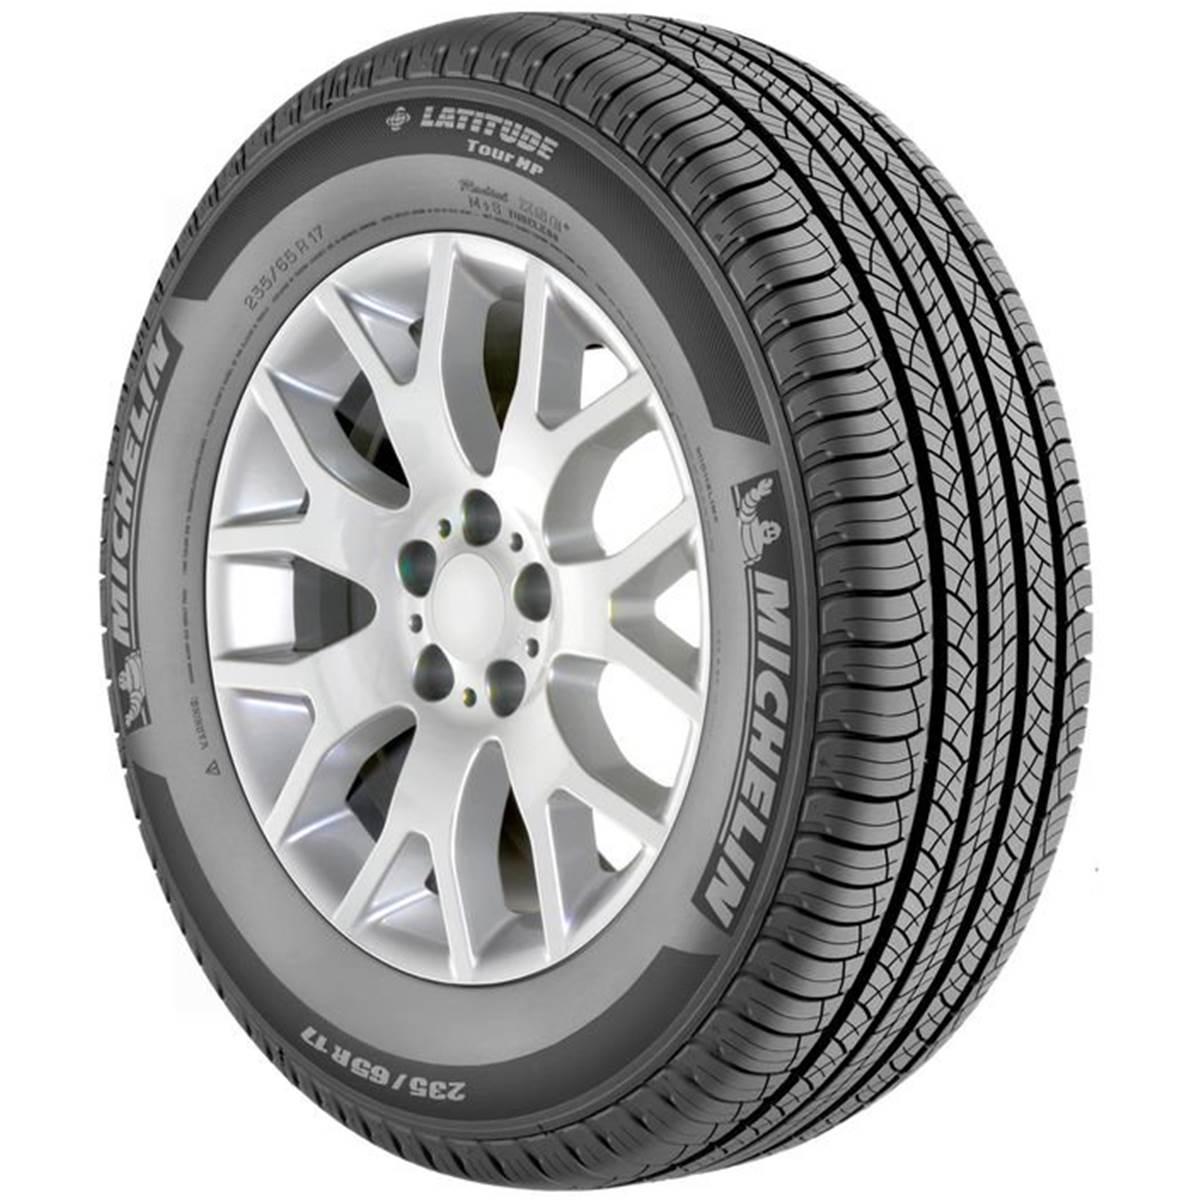 Pneu 4X4 Michelin 215/65R16 98H Latitude Tour Hp